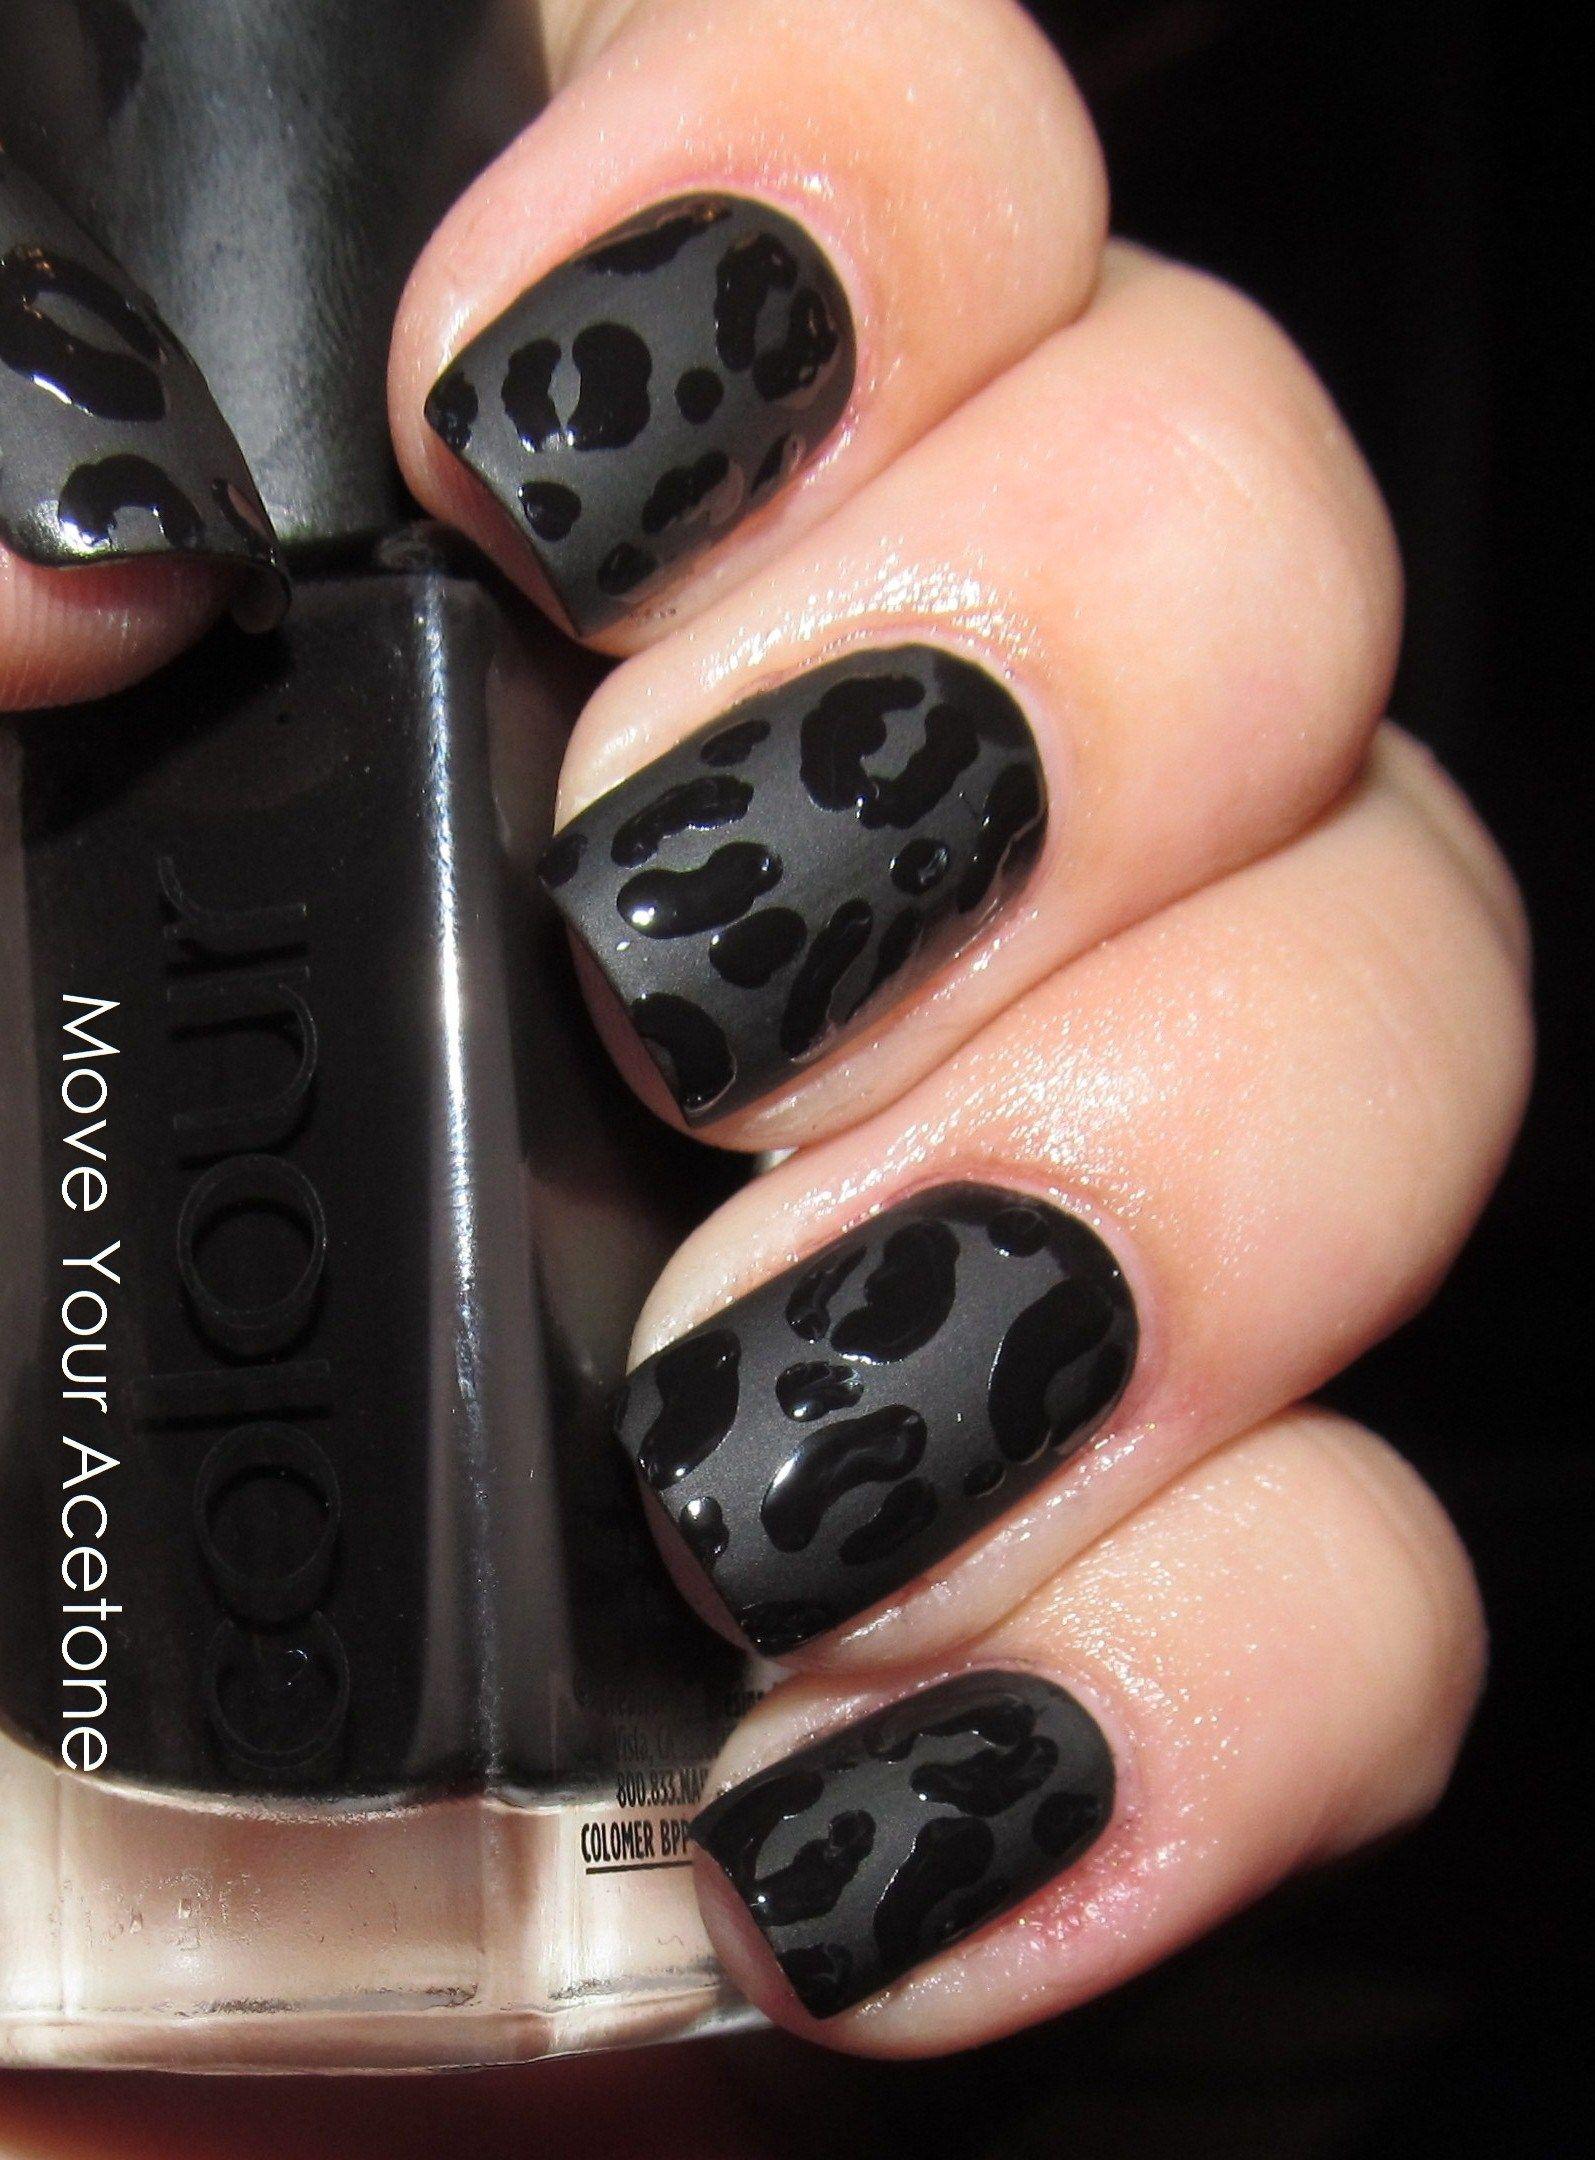 Black leopard print or Animal print nail art in matte - Matte/Shine Contrast Nail Art Tutorial Nail Art Inspiration